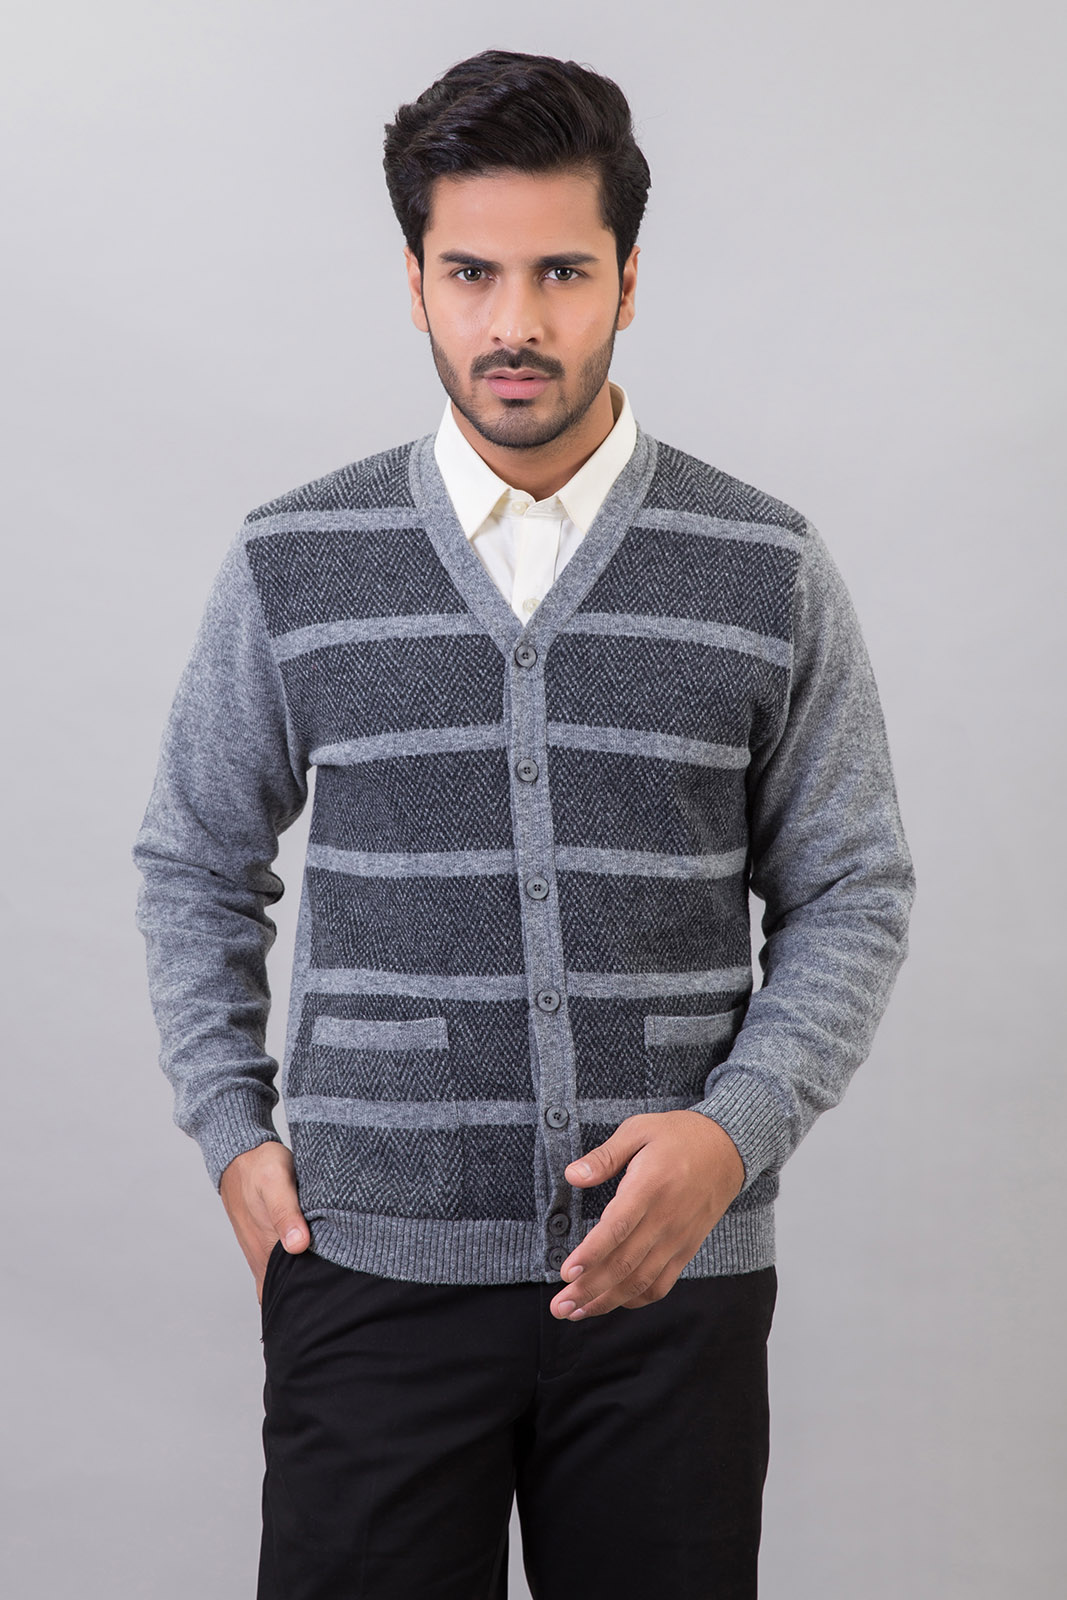 fc557de131 Bonanza Introducing Latest Men Sweaters Designs 2017